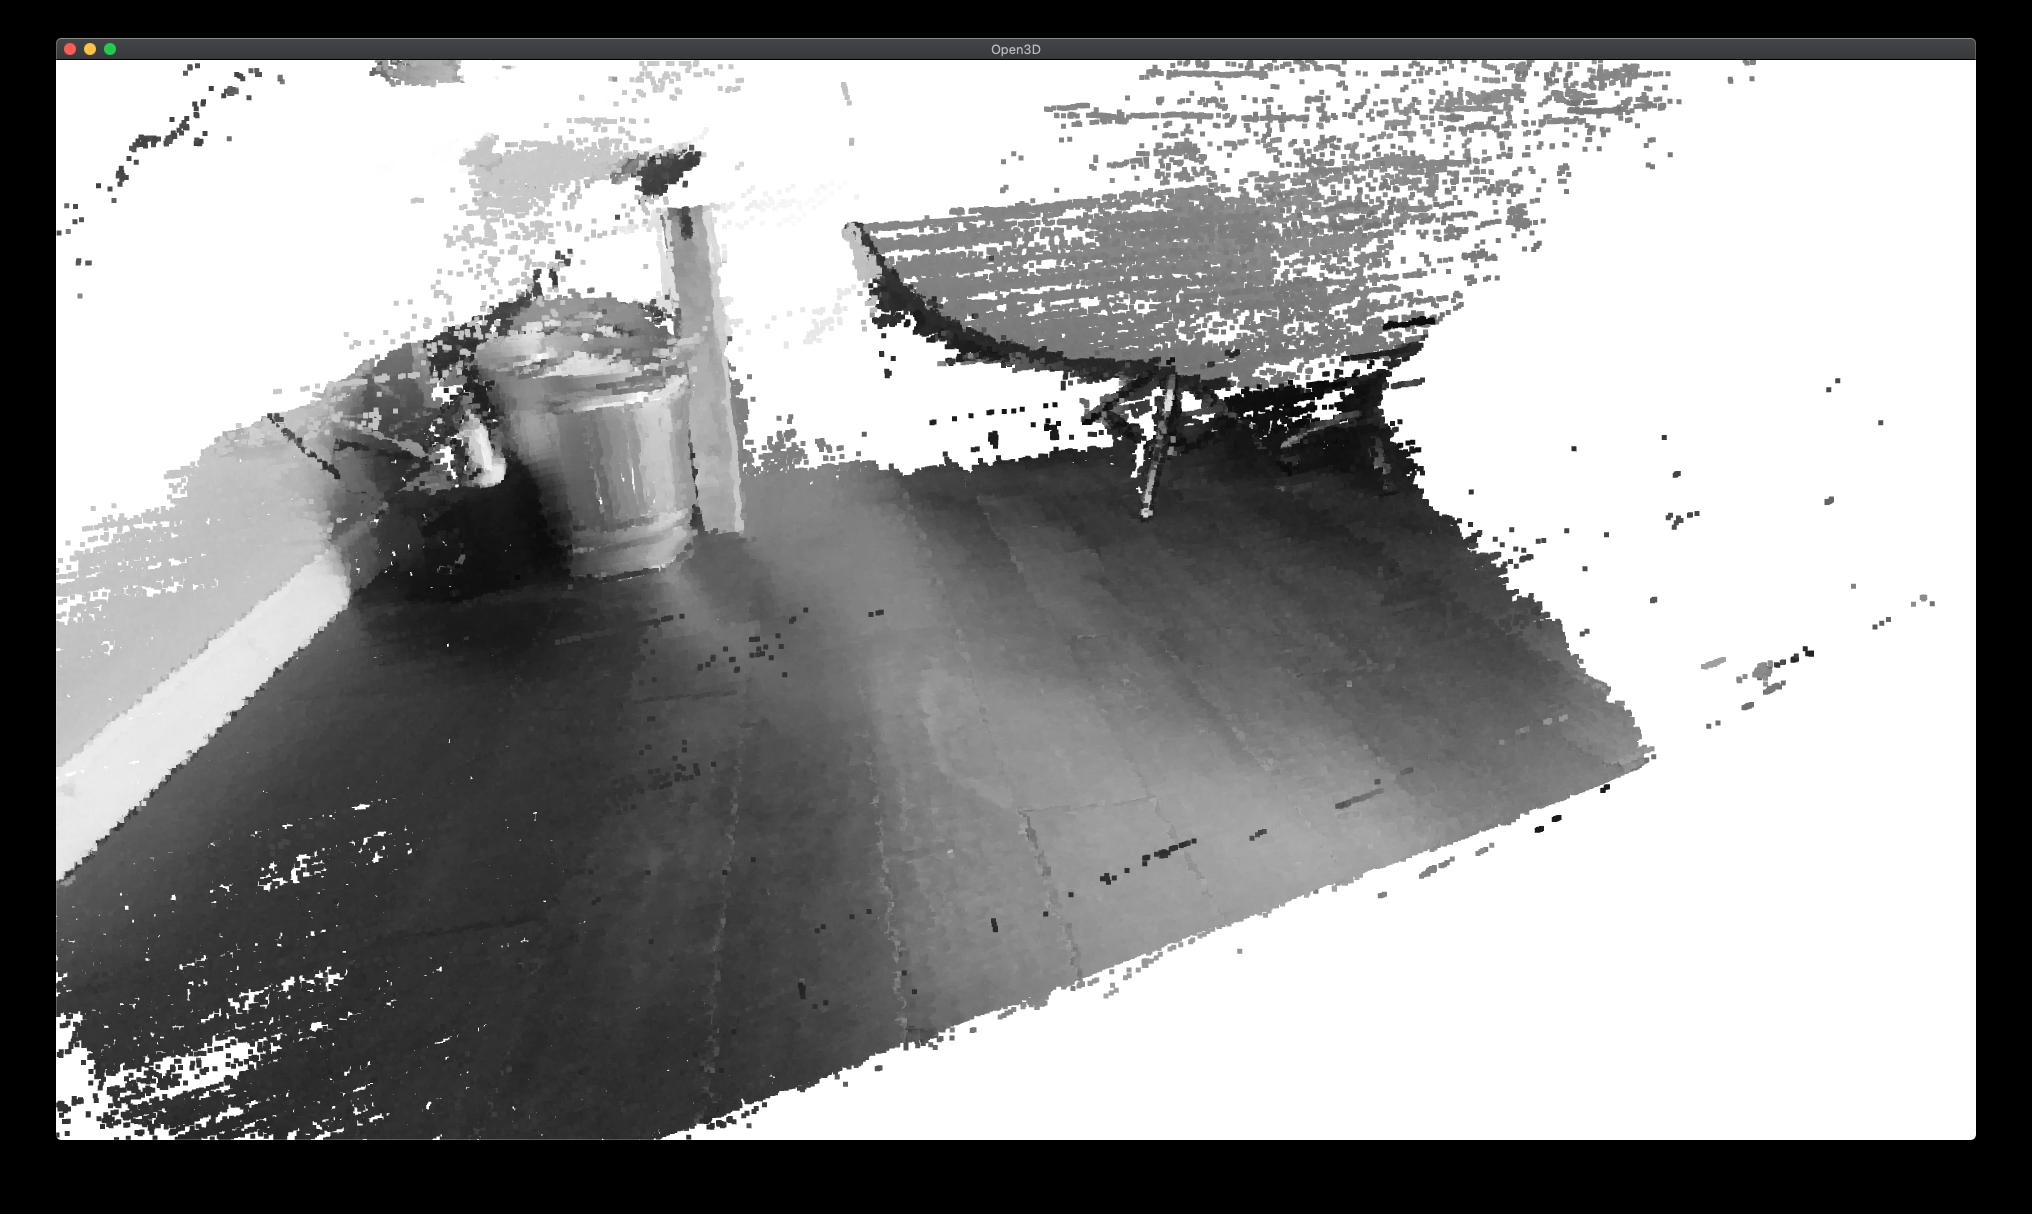 Subpixel Disparity (3,072 depth steps)